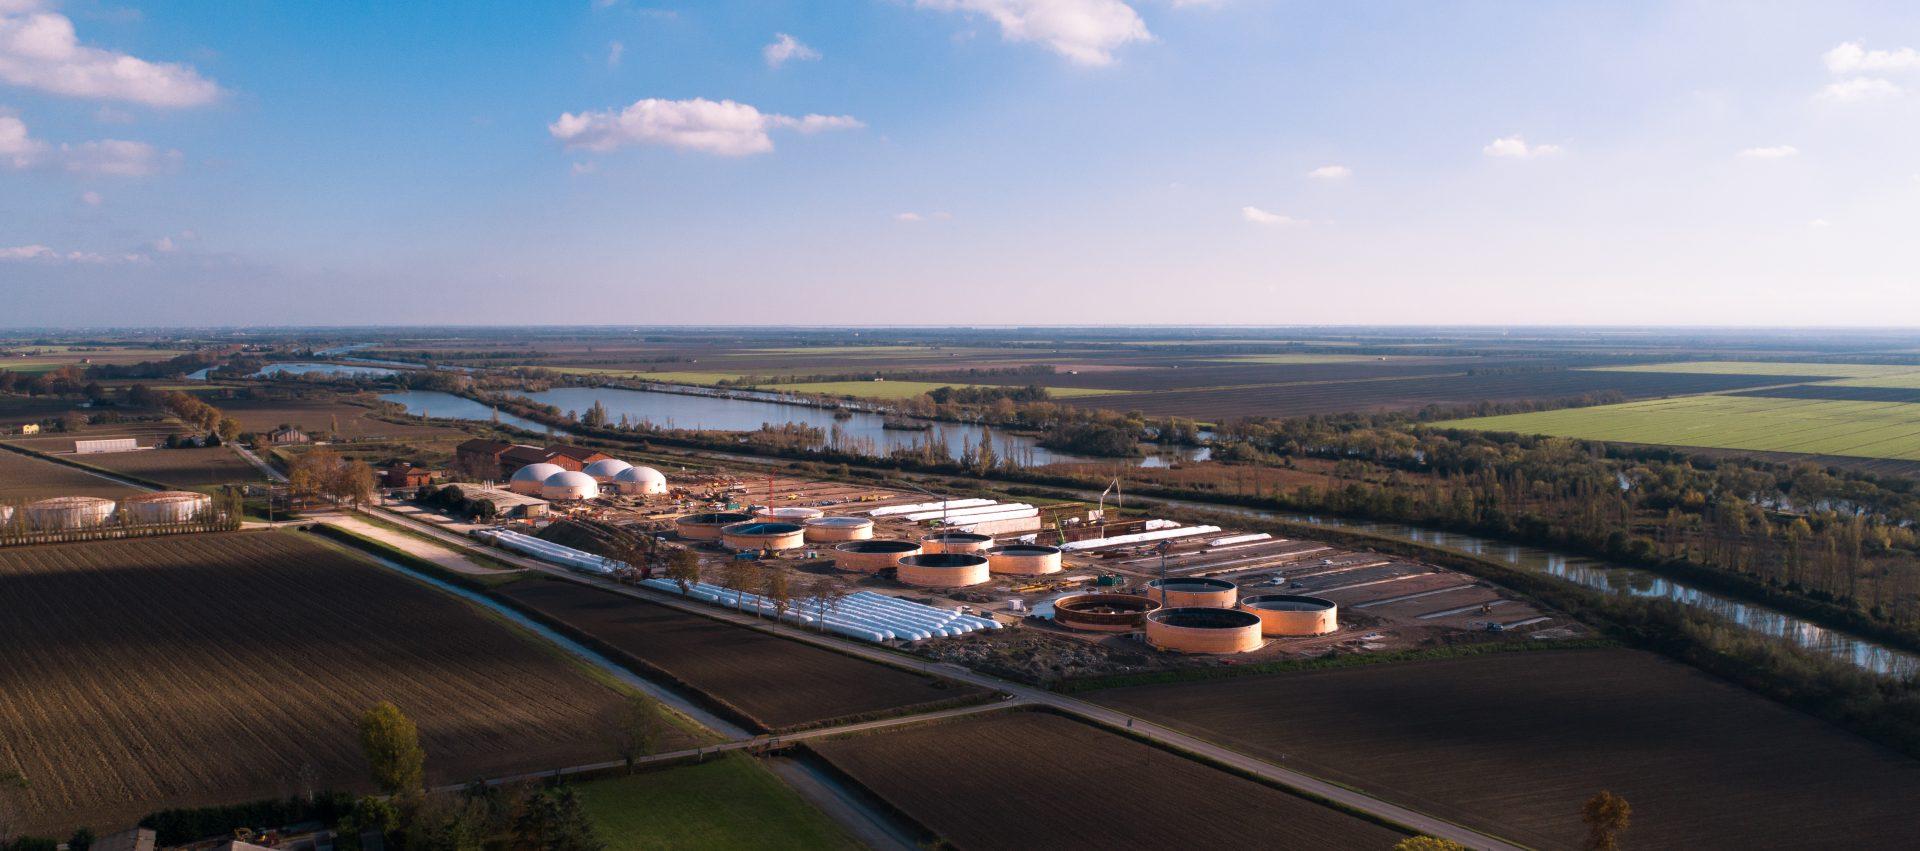 IES Biogas | Costruzione impianti biogas a Ostellato